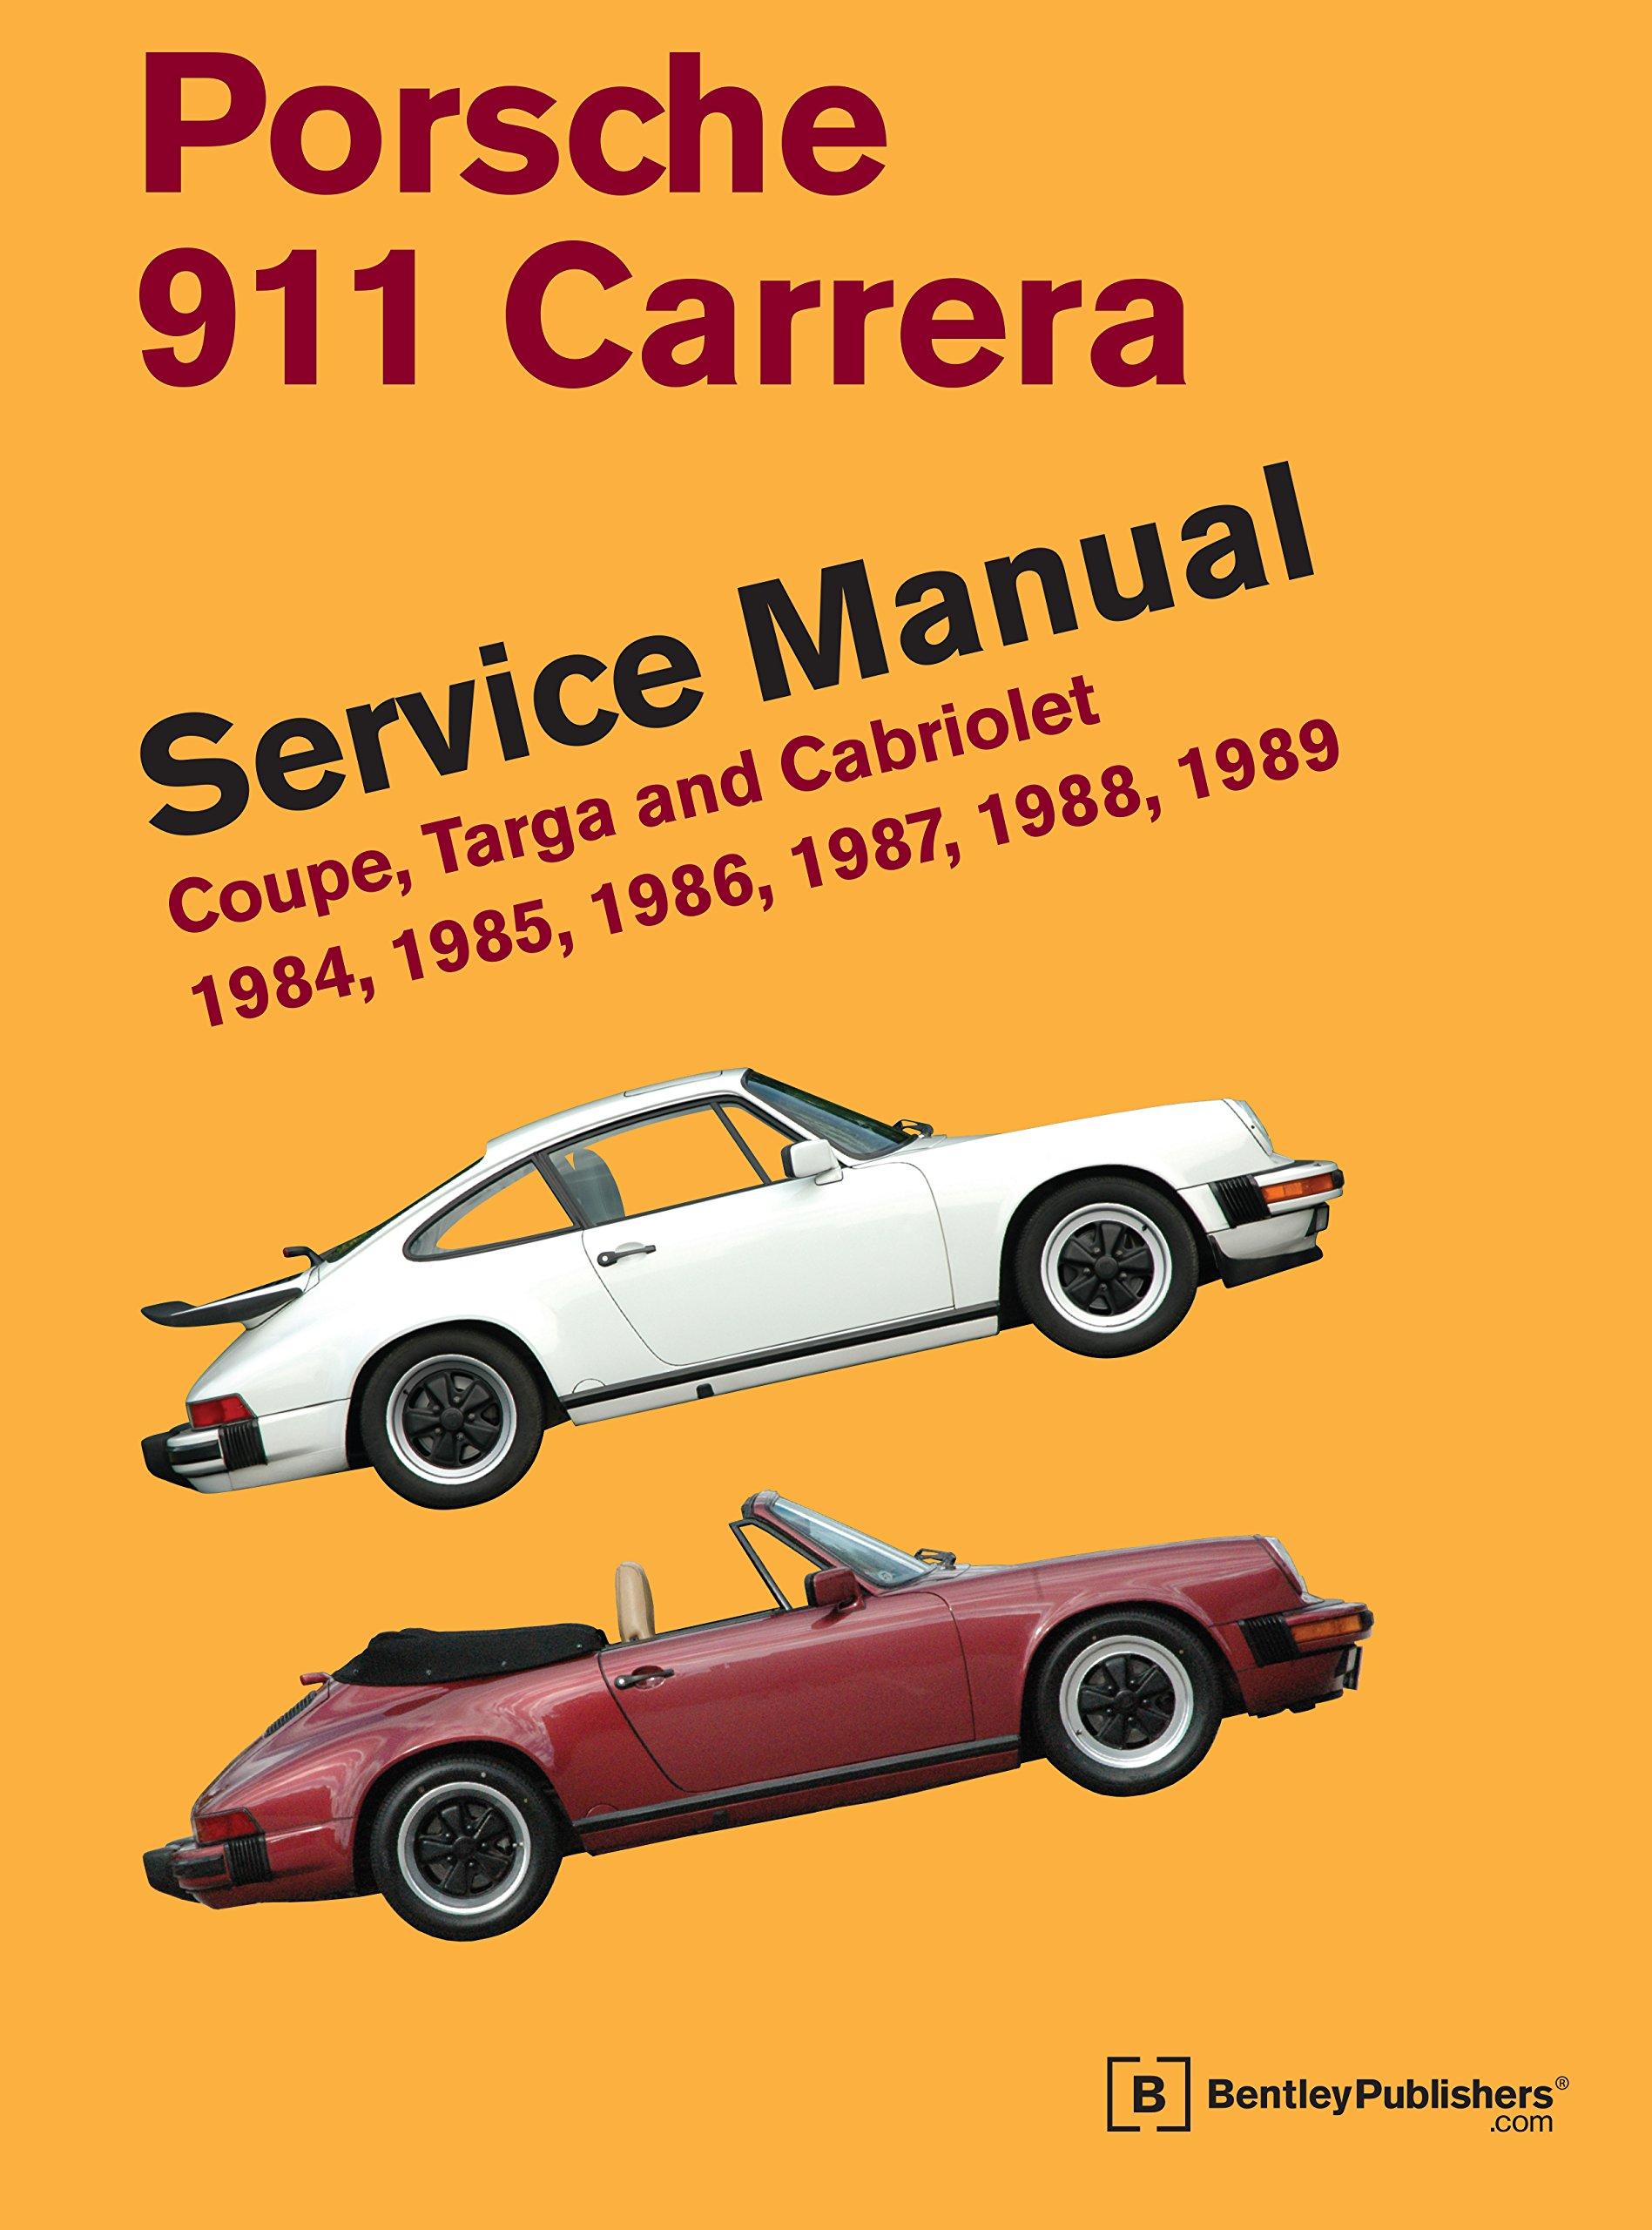 Porsche 911 Carrera Service Manual: 1984, 1985, 1986, 1987, 1988, 1989:  Coupe, Targa and Cabriolet: Bentley Publishers: 9780837616964: Books -  Amazon.ca